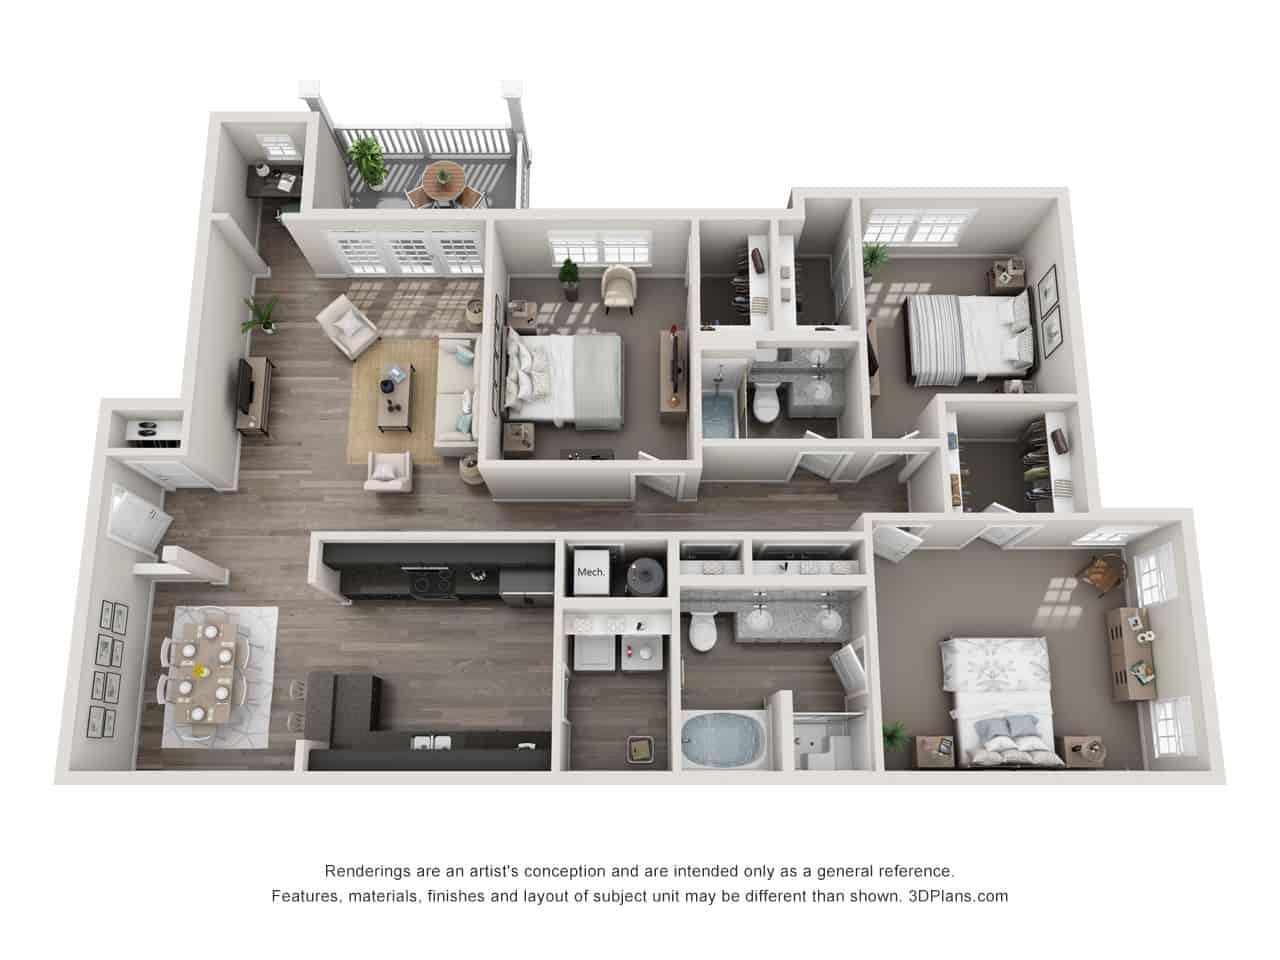 GREYSTONE POINTE APARTMENTS IN KNOXVILLE TN three bedroom floor plan deck